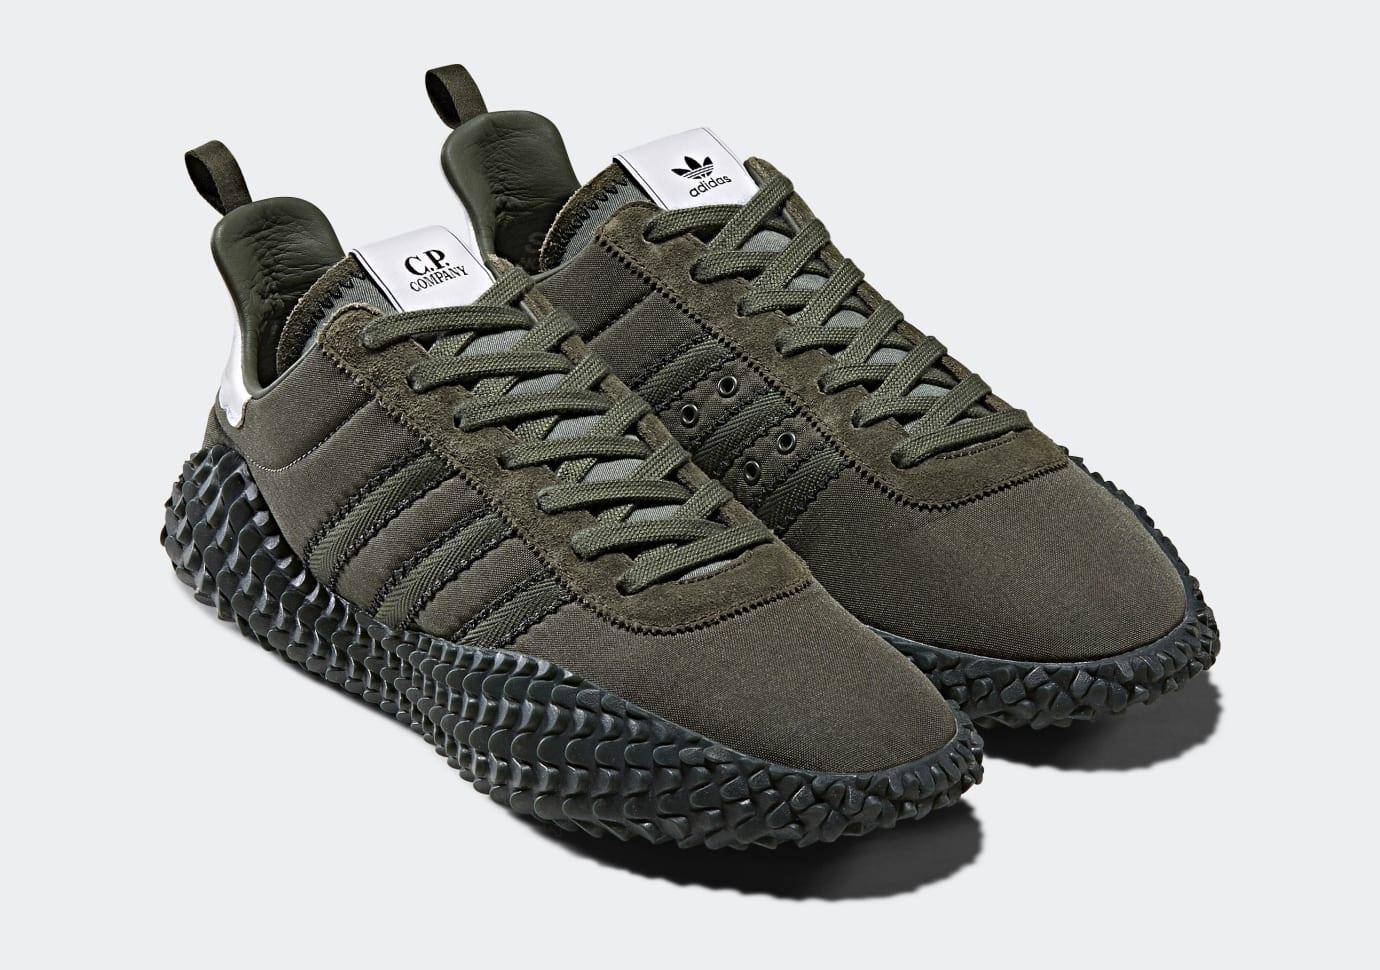 Adidas x C.P. Company Kamanda 'Green